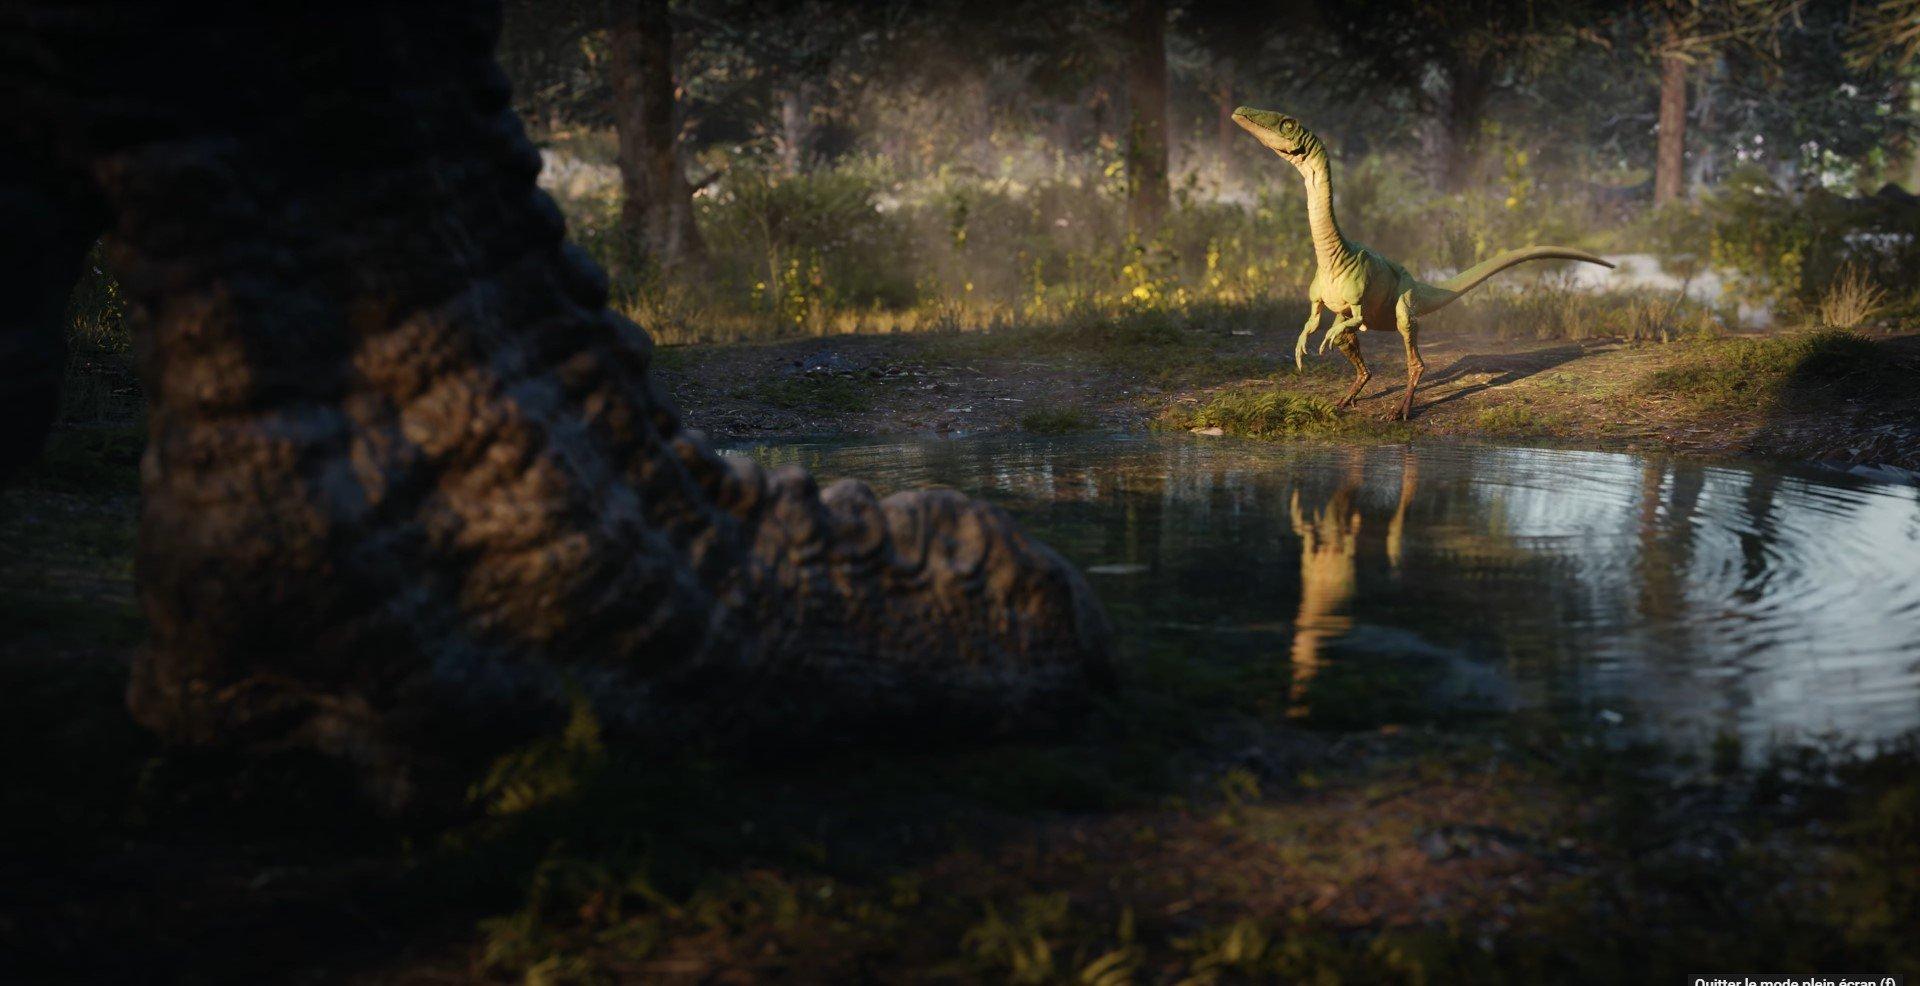 Jurassic-World-Evolution-2-Screenshot-Announcement-Trailer-Summer-Game-Fest-2021-1